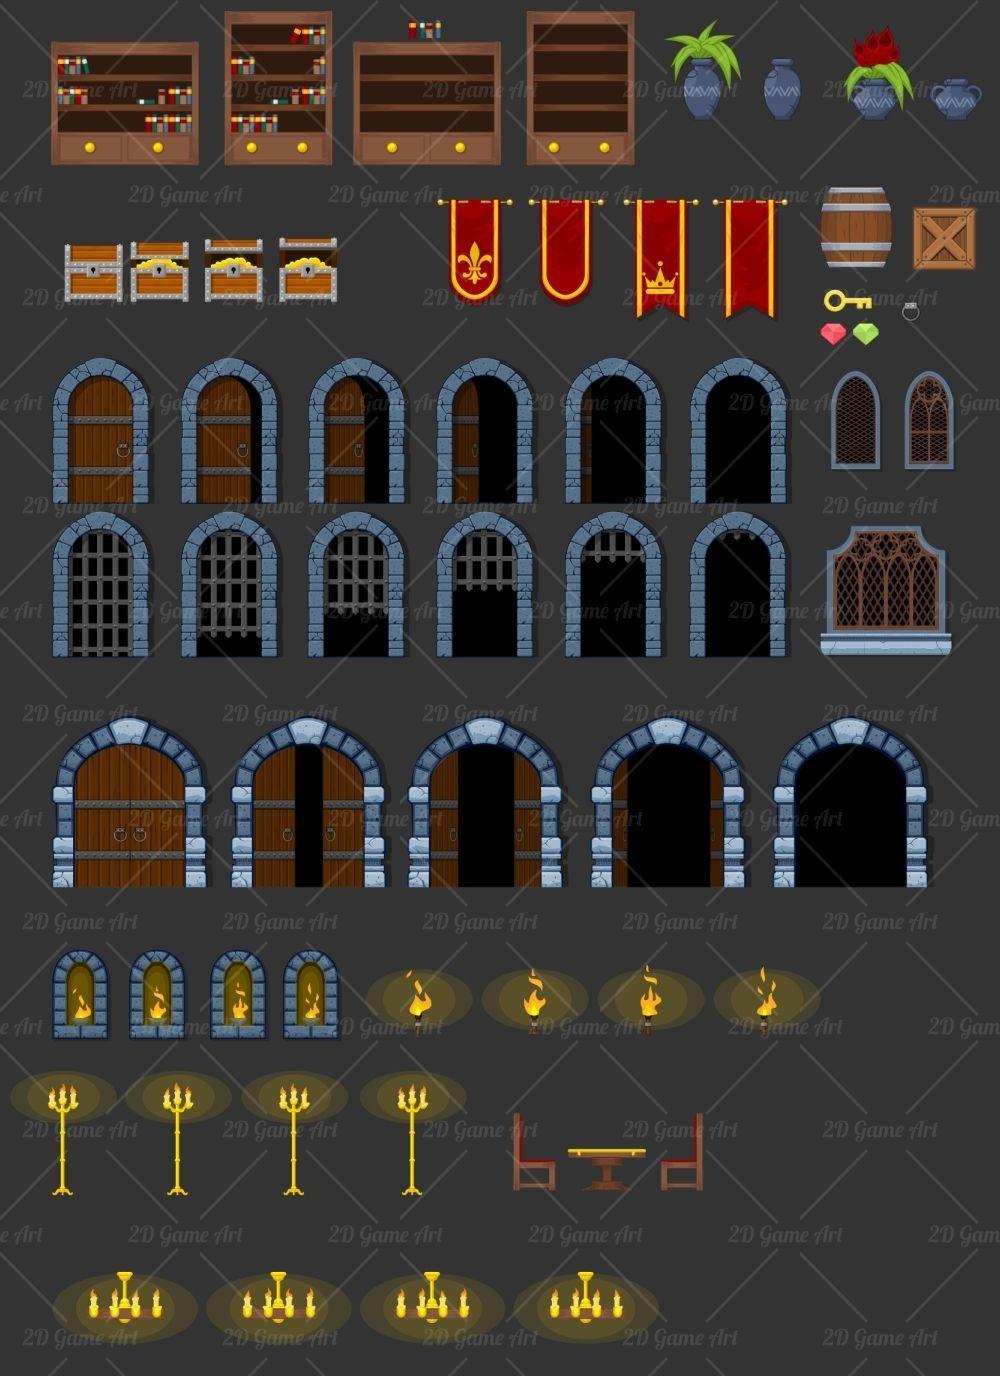 The Castle Game Tileset Gameart2d Com Sellfy Com